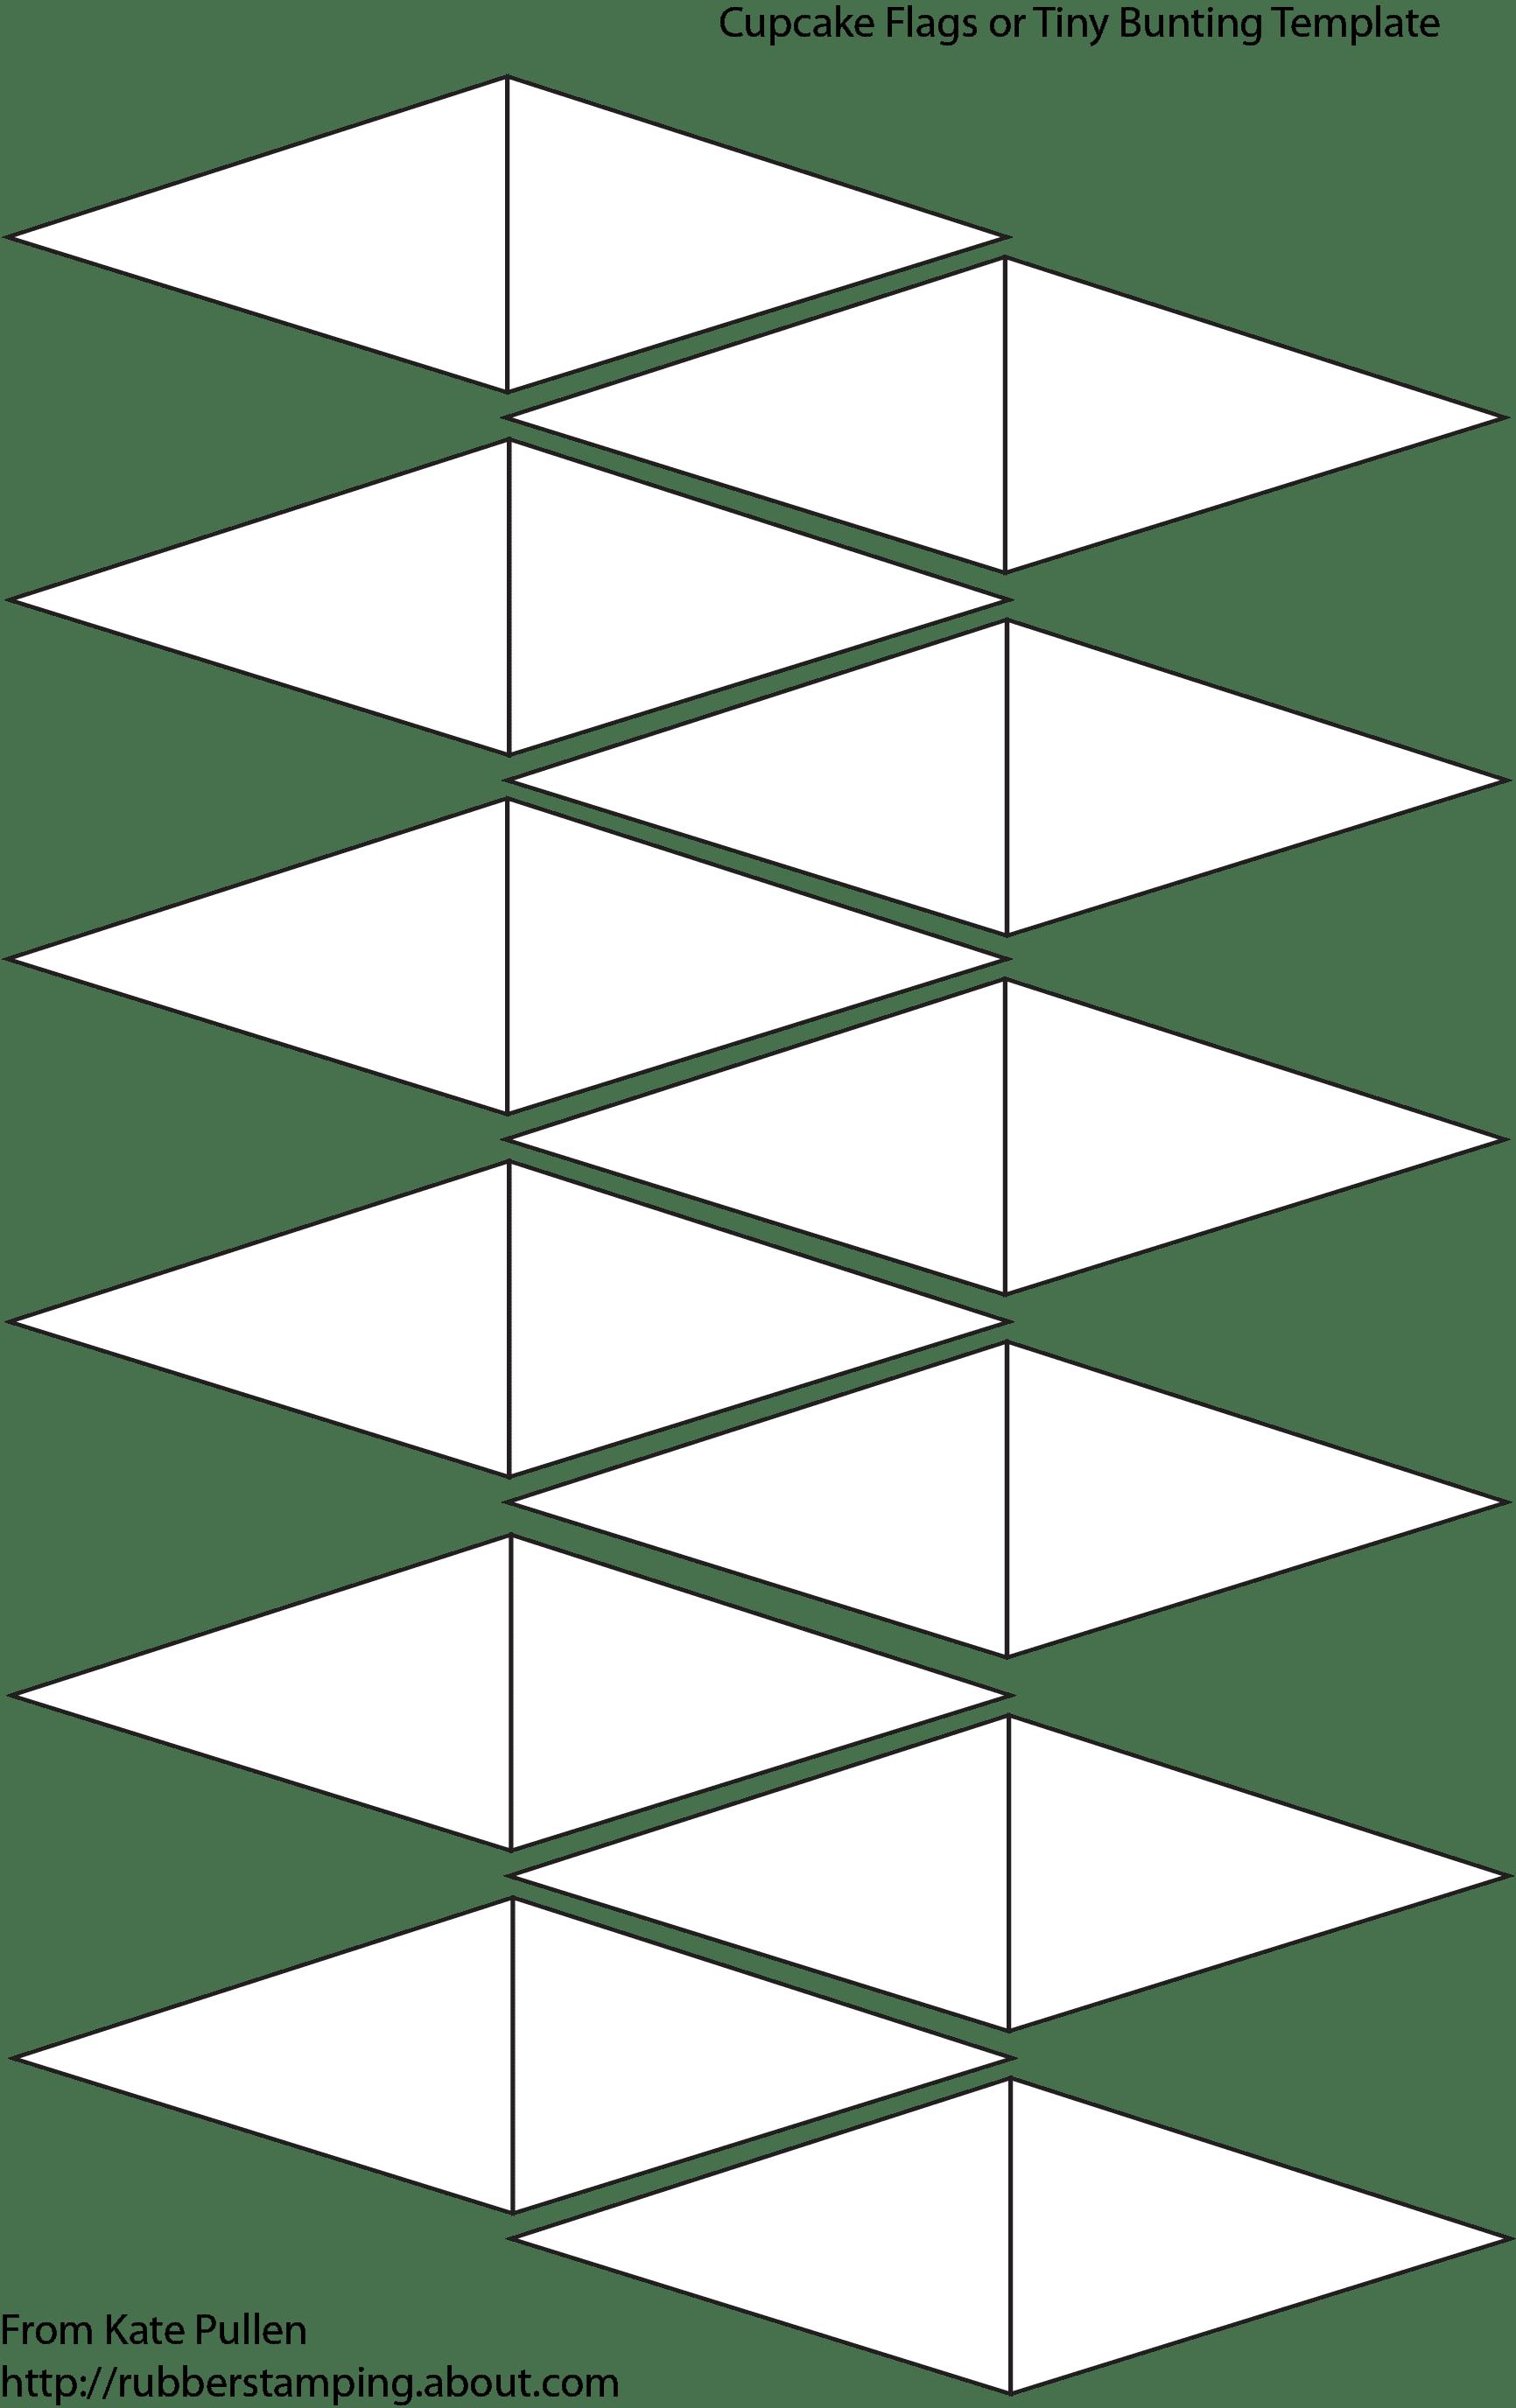 blank cupcake flags template